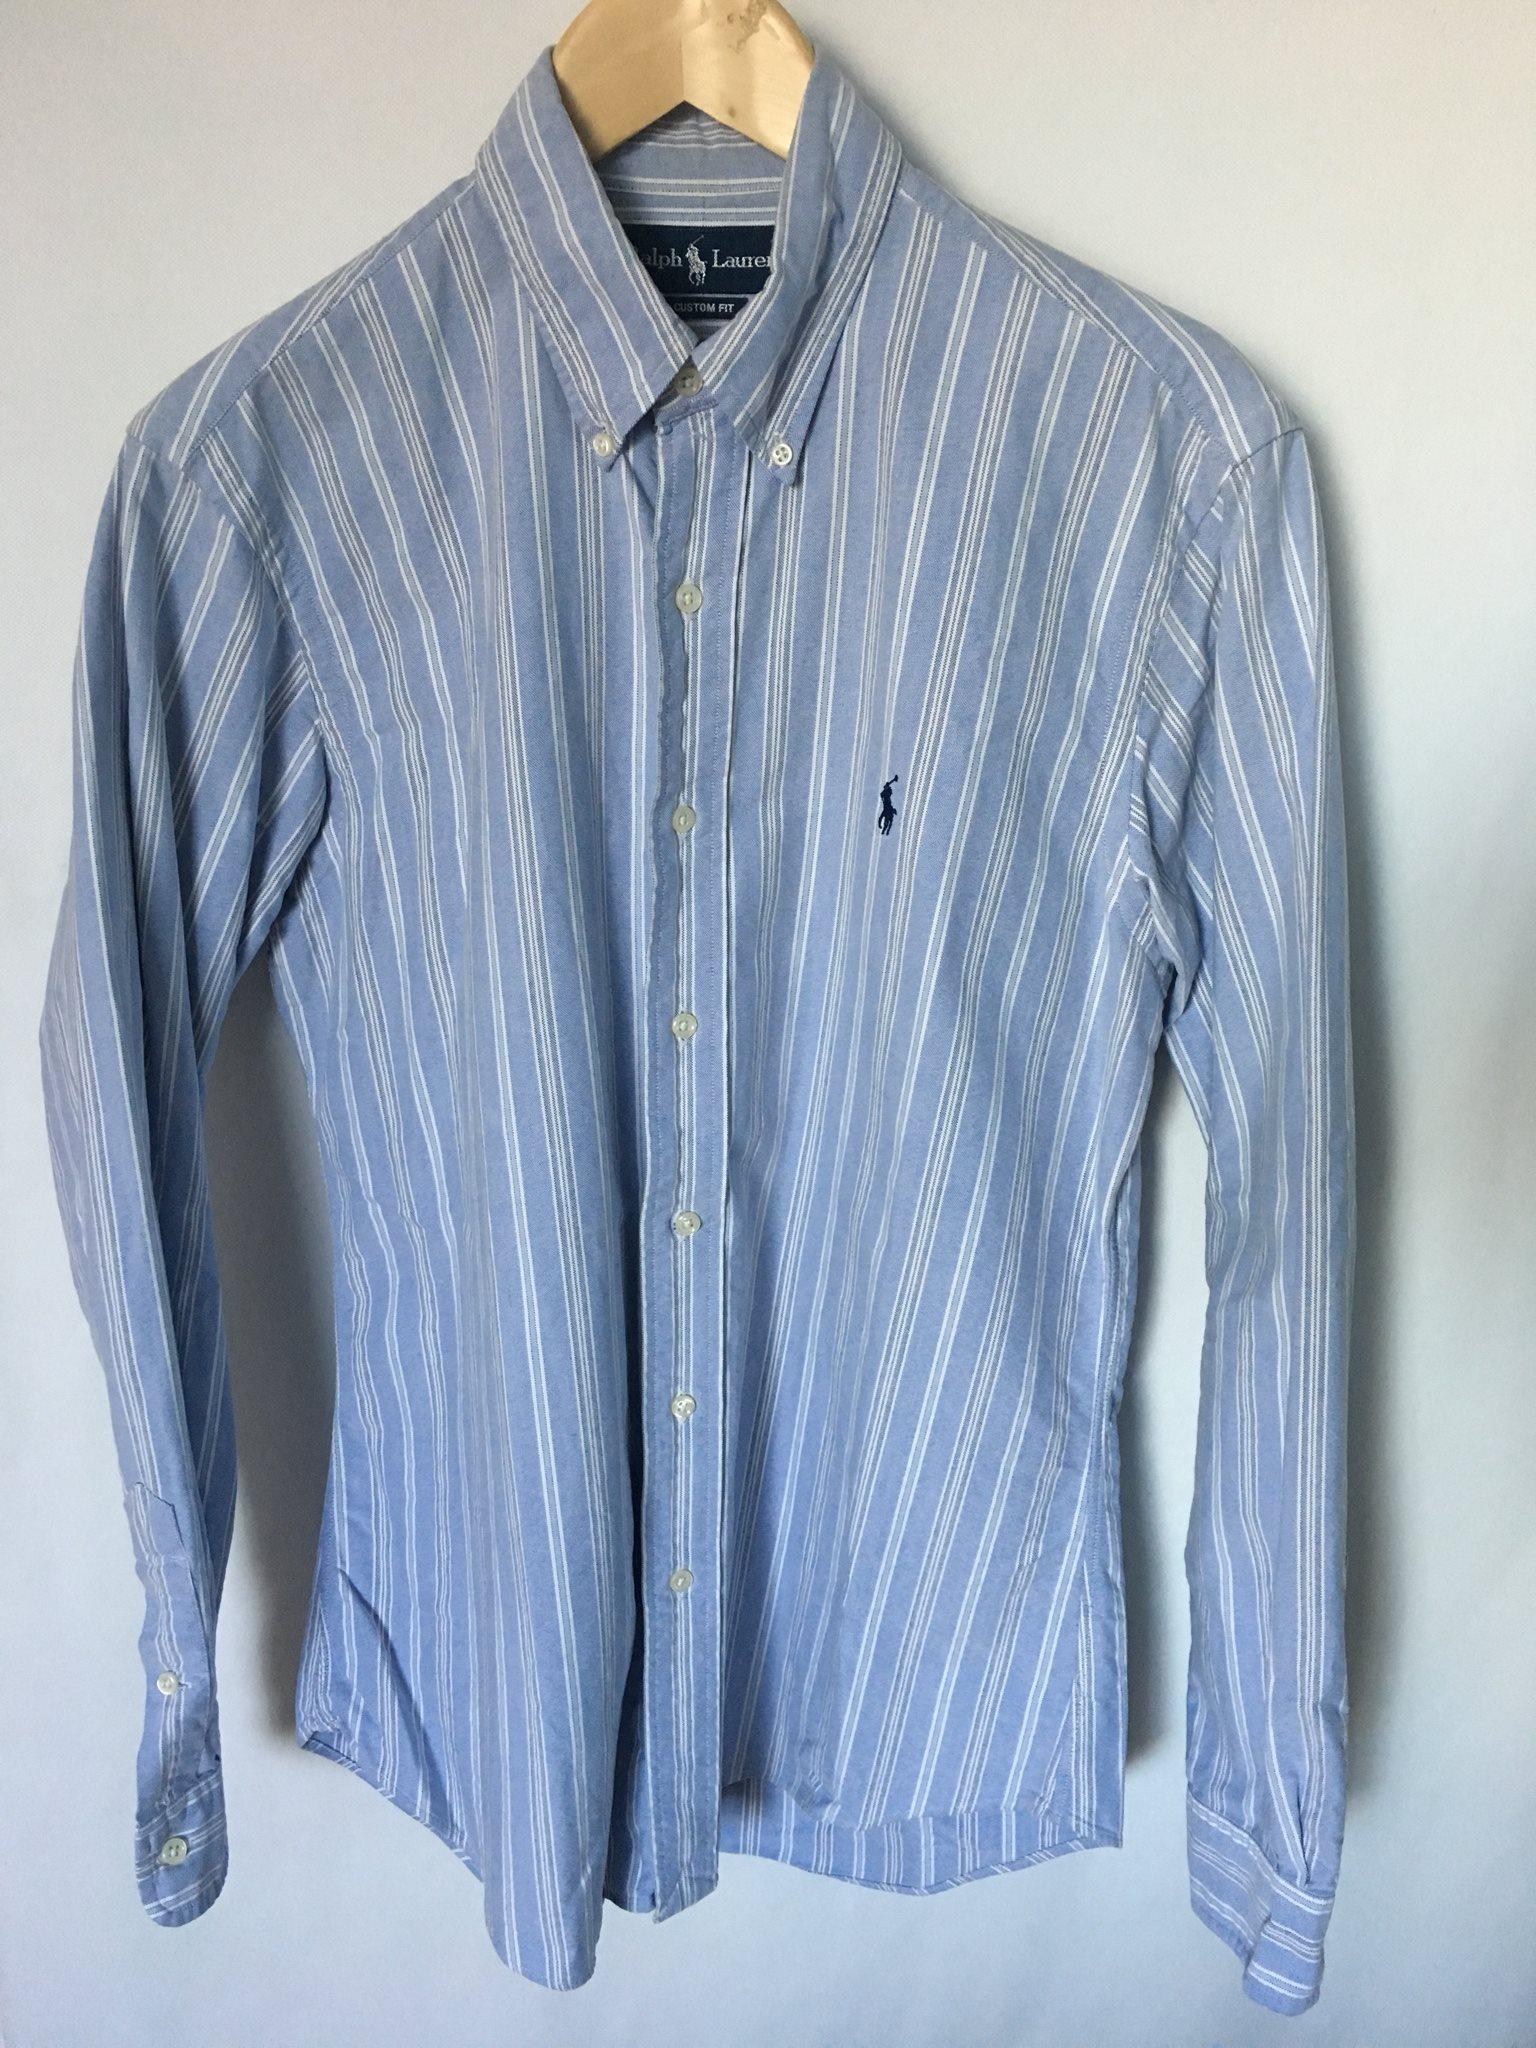 Ralph Lauren oxford skjorta blå vit randig strl M (327933950) ᐈ Köp ... 8b96e1988f151